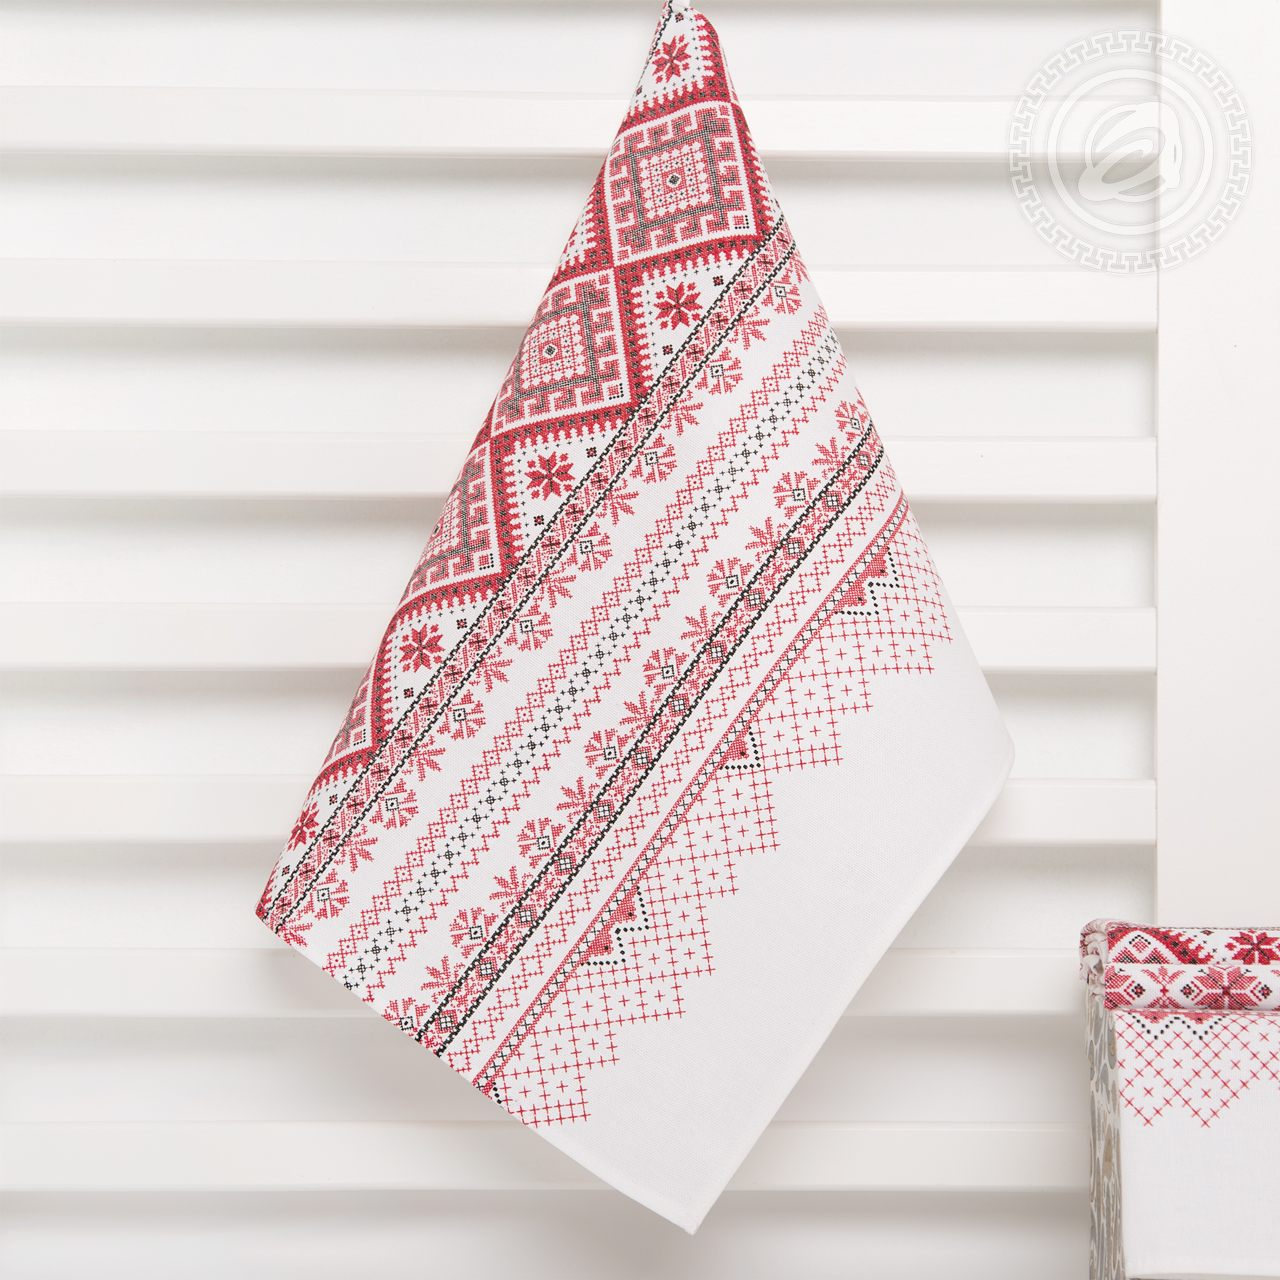 Кухонное полотенце Грандсток 16388731 от Grandstock